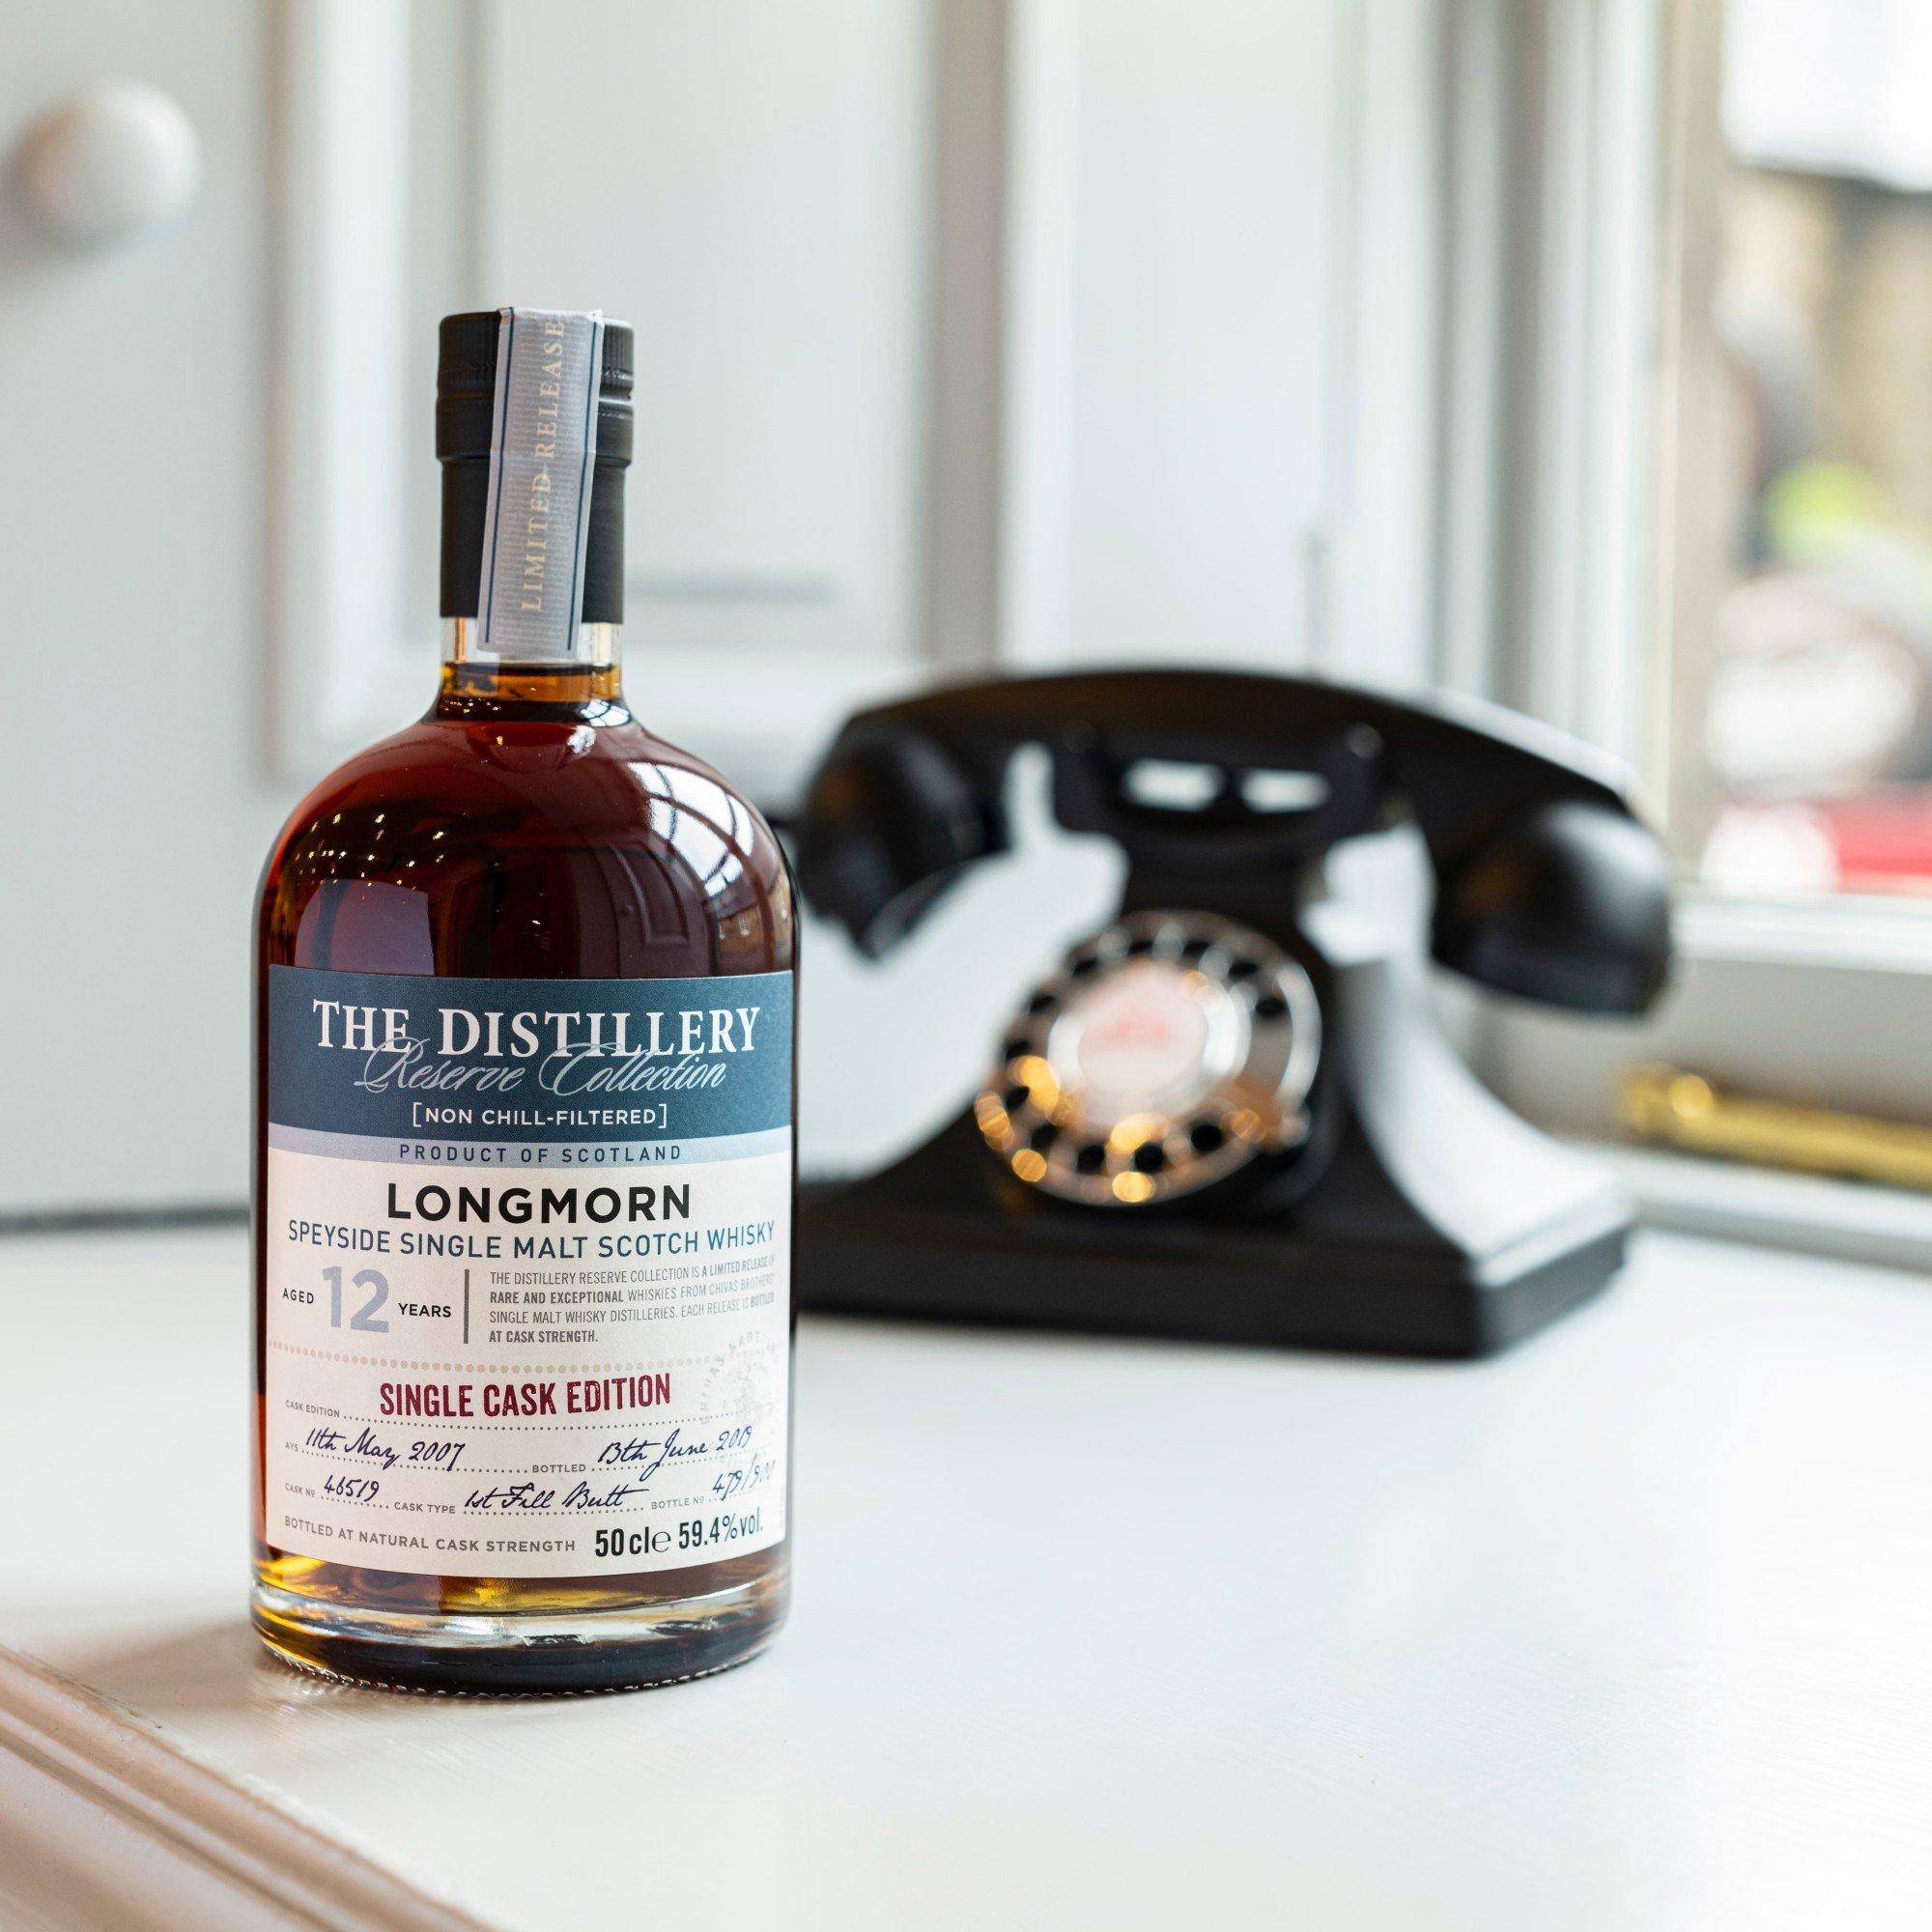 Longmorn 12 Year Old Single Malt Whisky